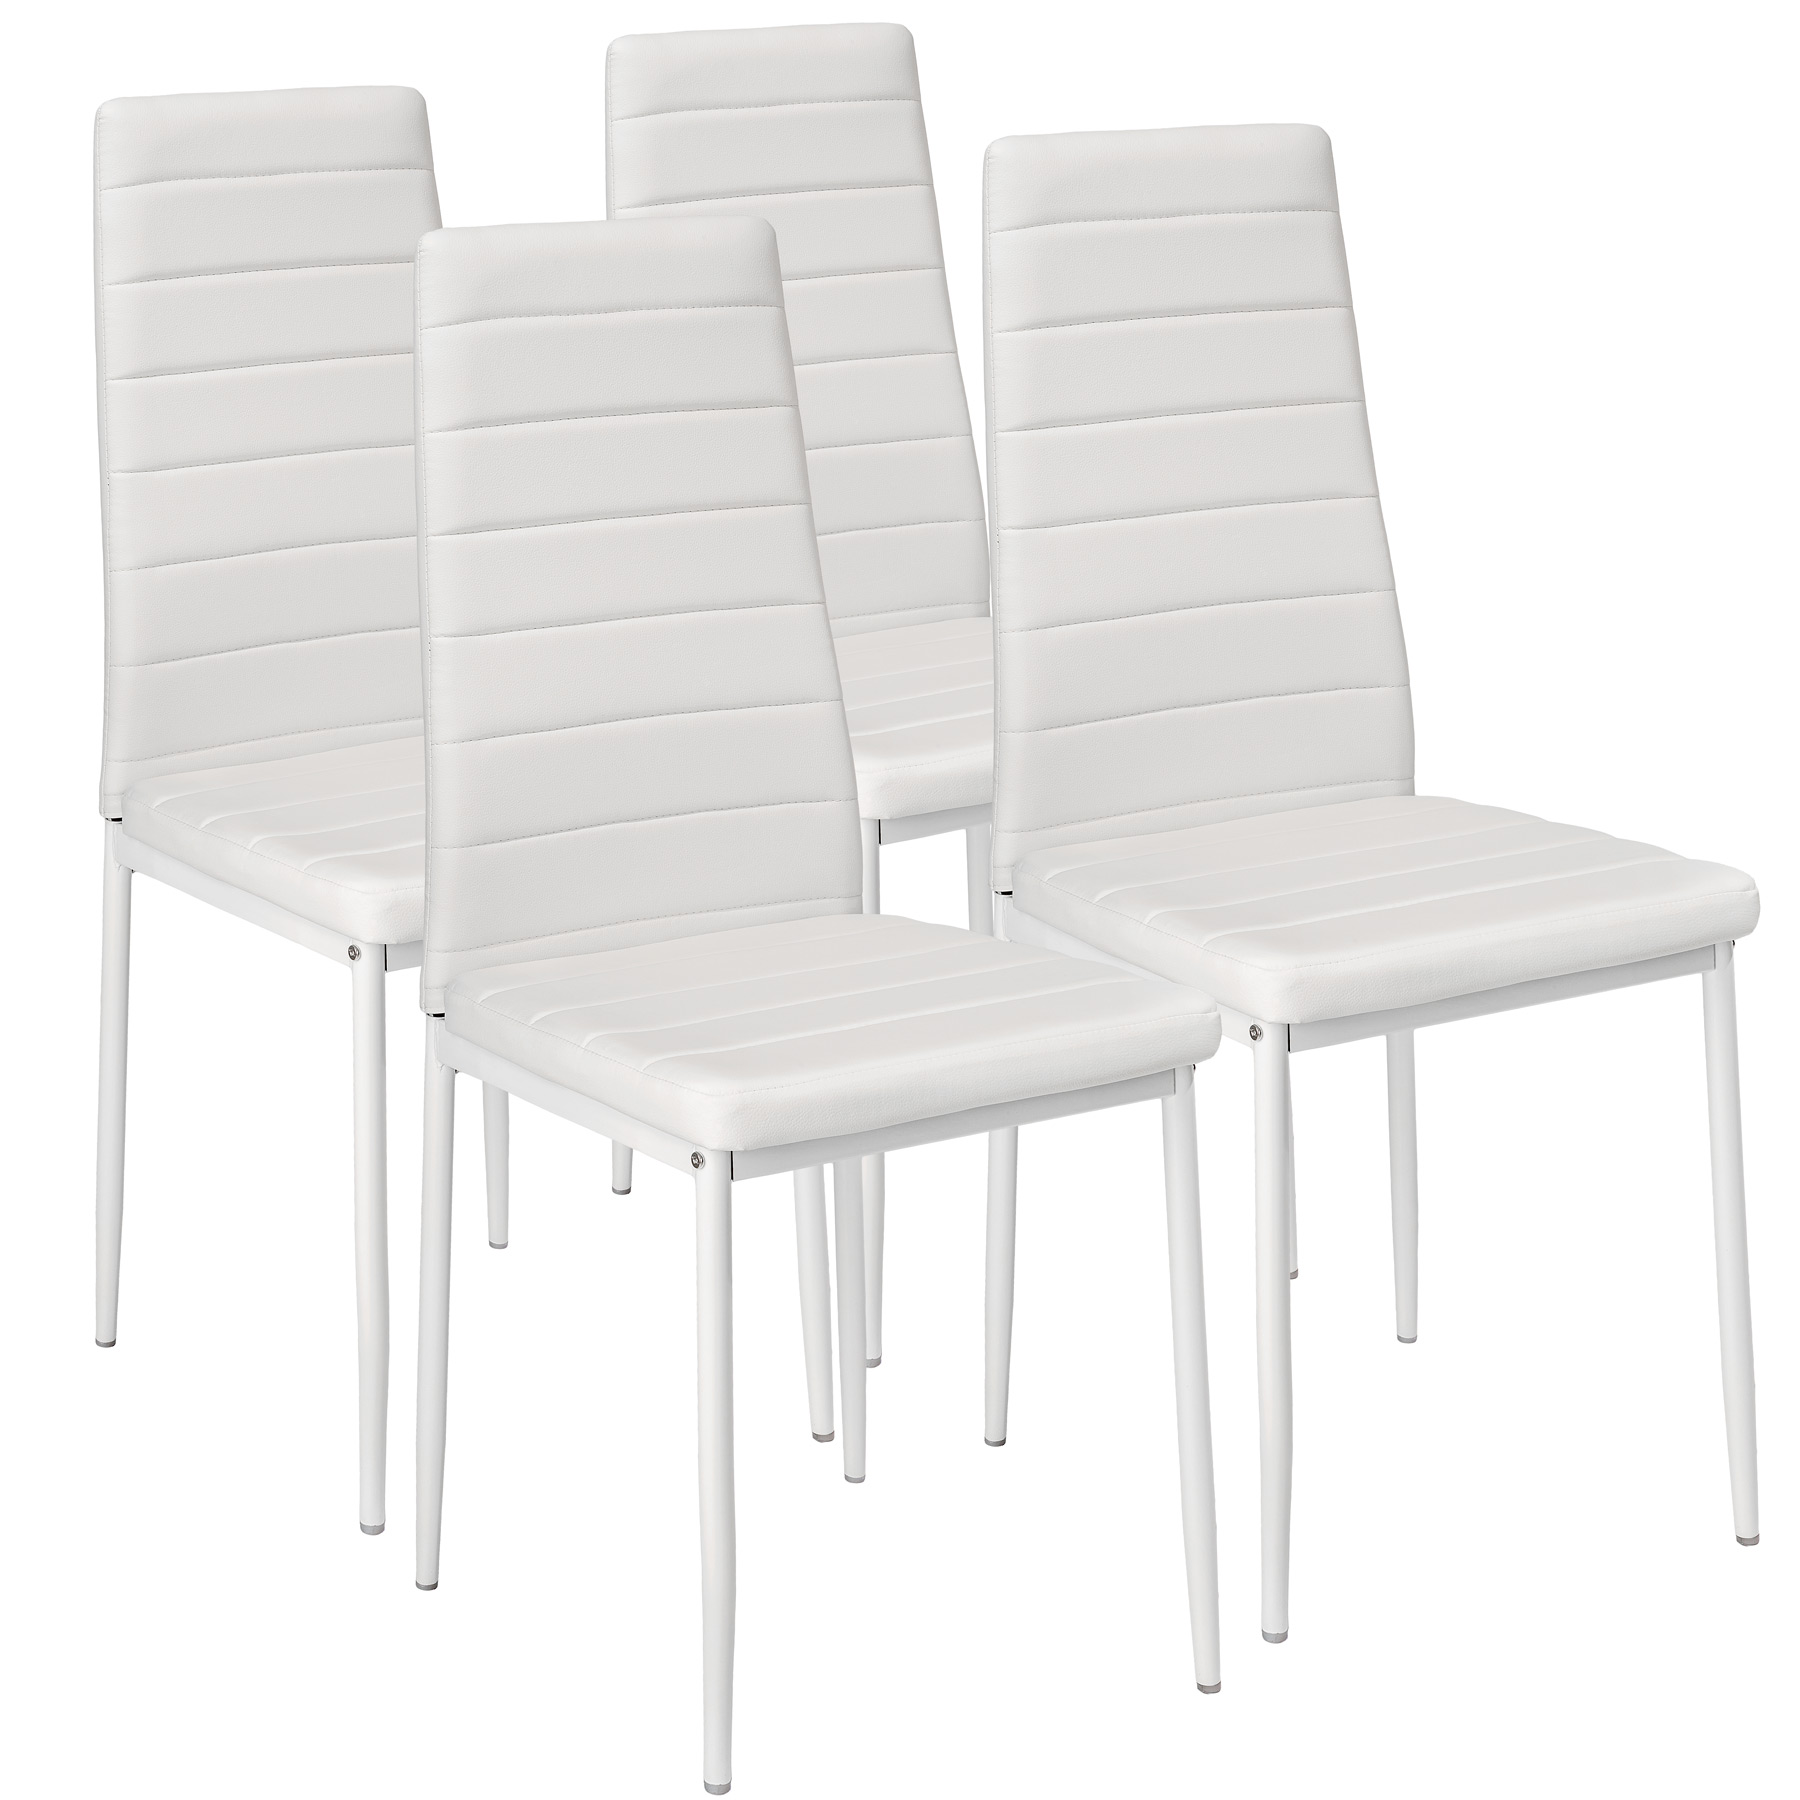 Мягкий стул, кожзам белый Milano 4 шт